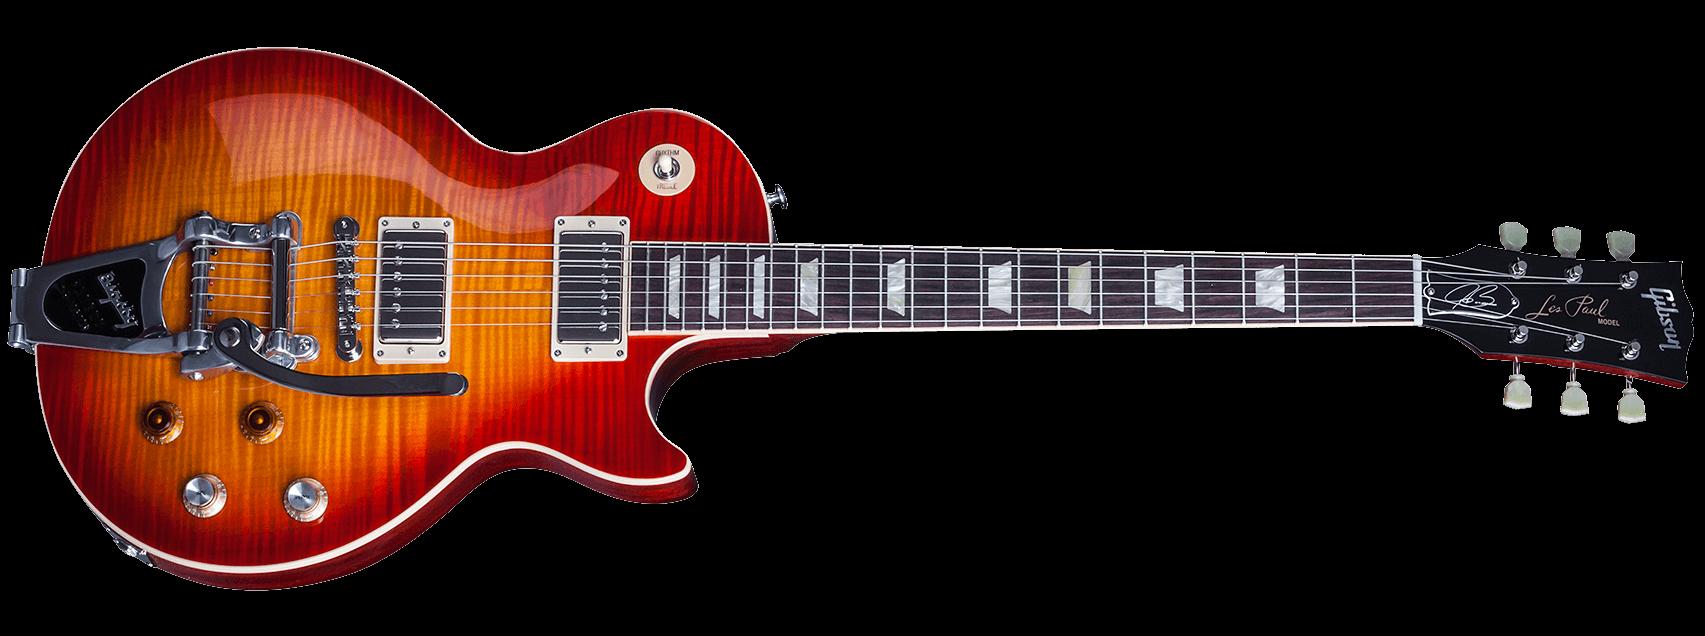 Gibson Les Paul Joe Bonamassa Tomato Soup Burst Bigsby